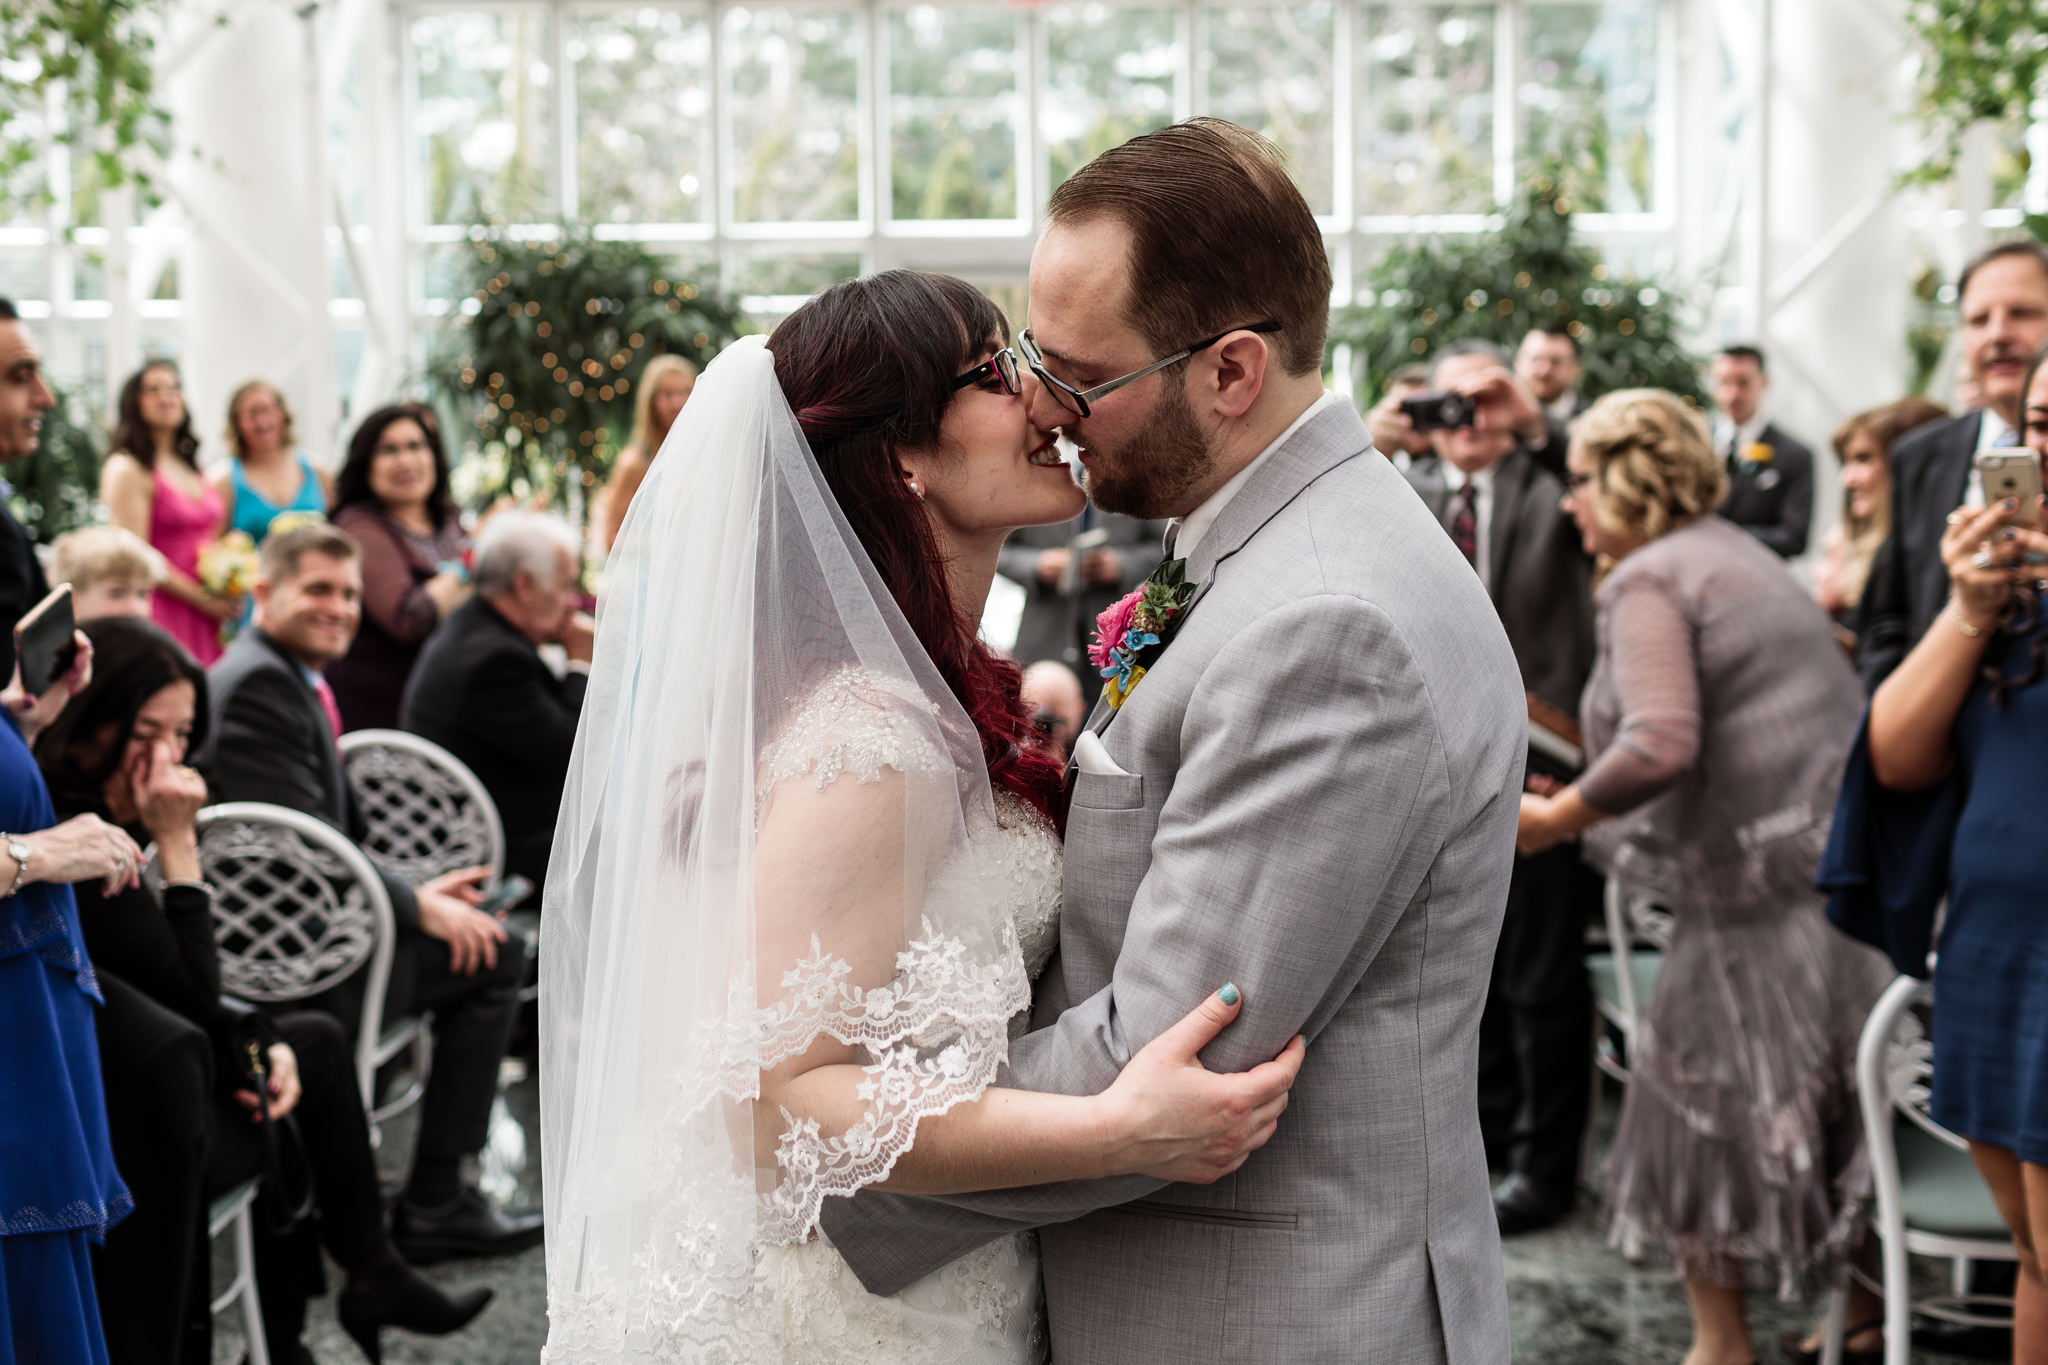 Hanchar_Madison_Hotel_NJ_Wedding_7R5A8344.jpg